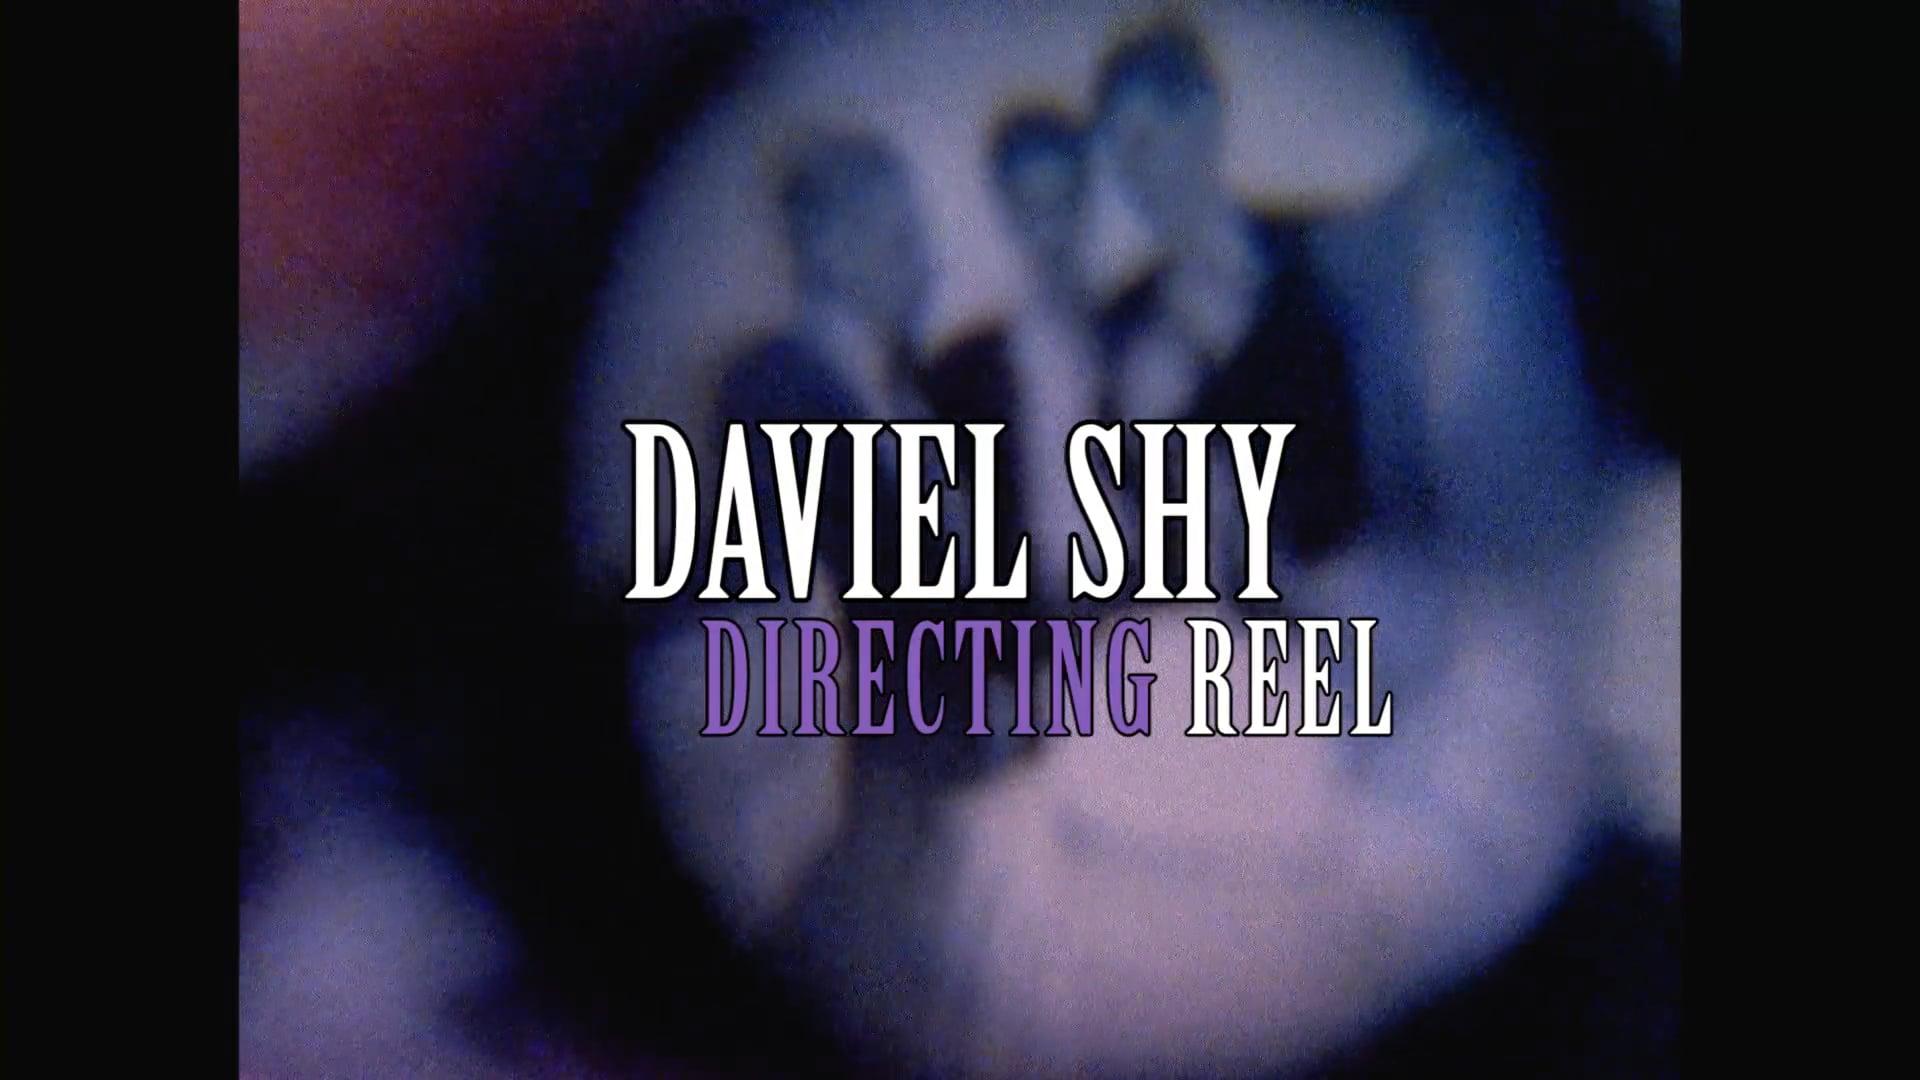 Daviel Shy directing reel